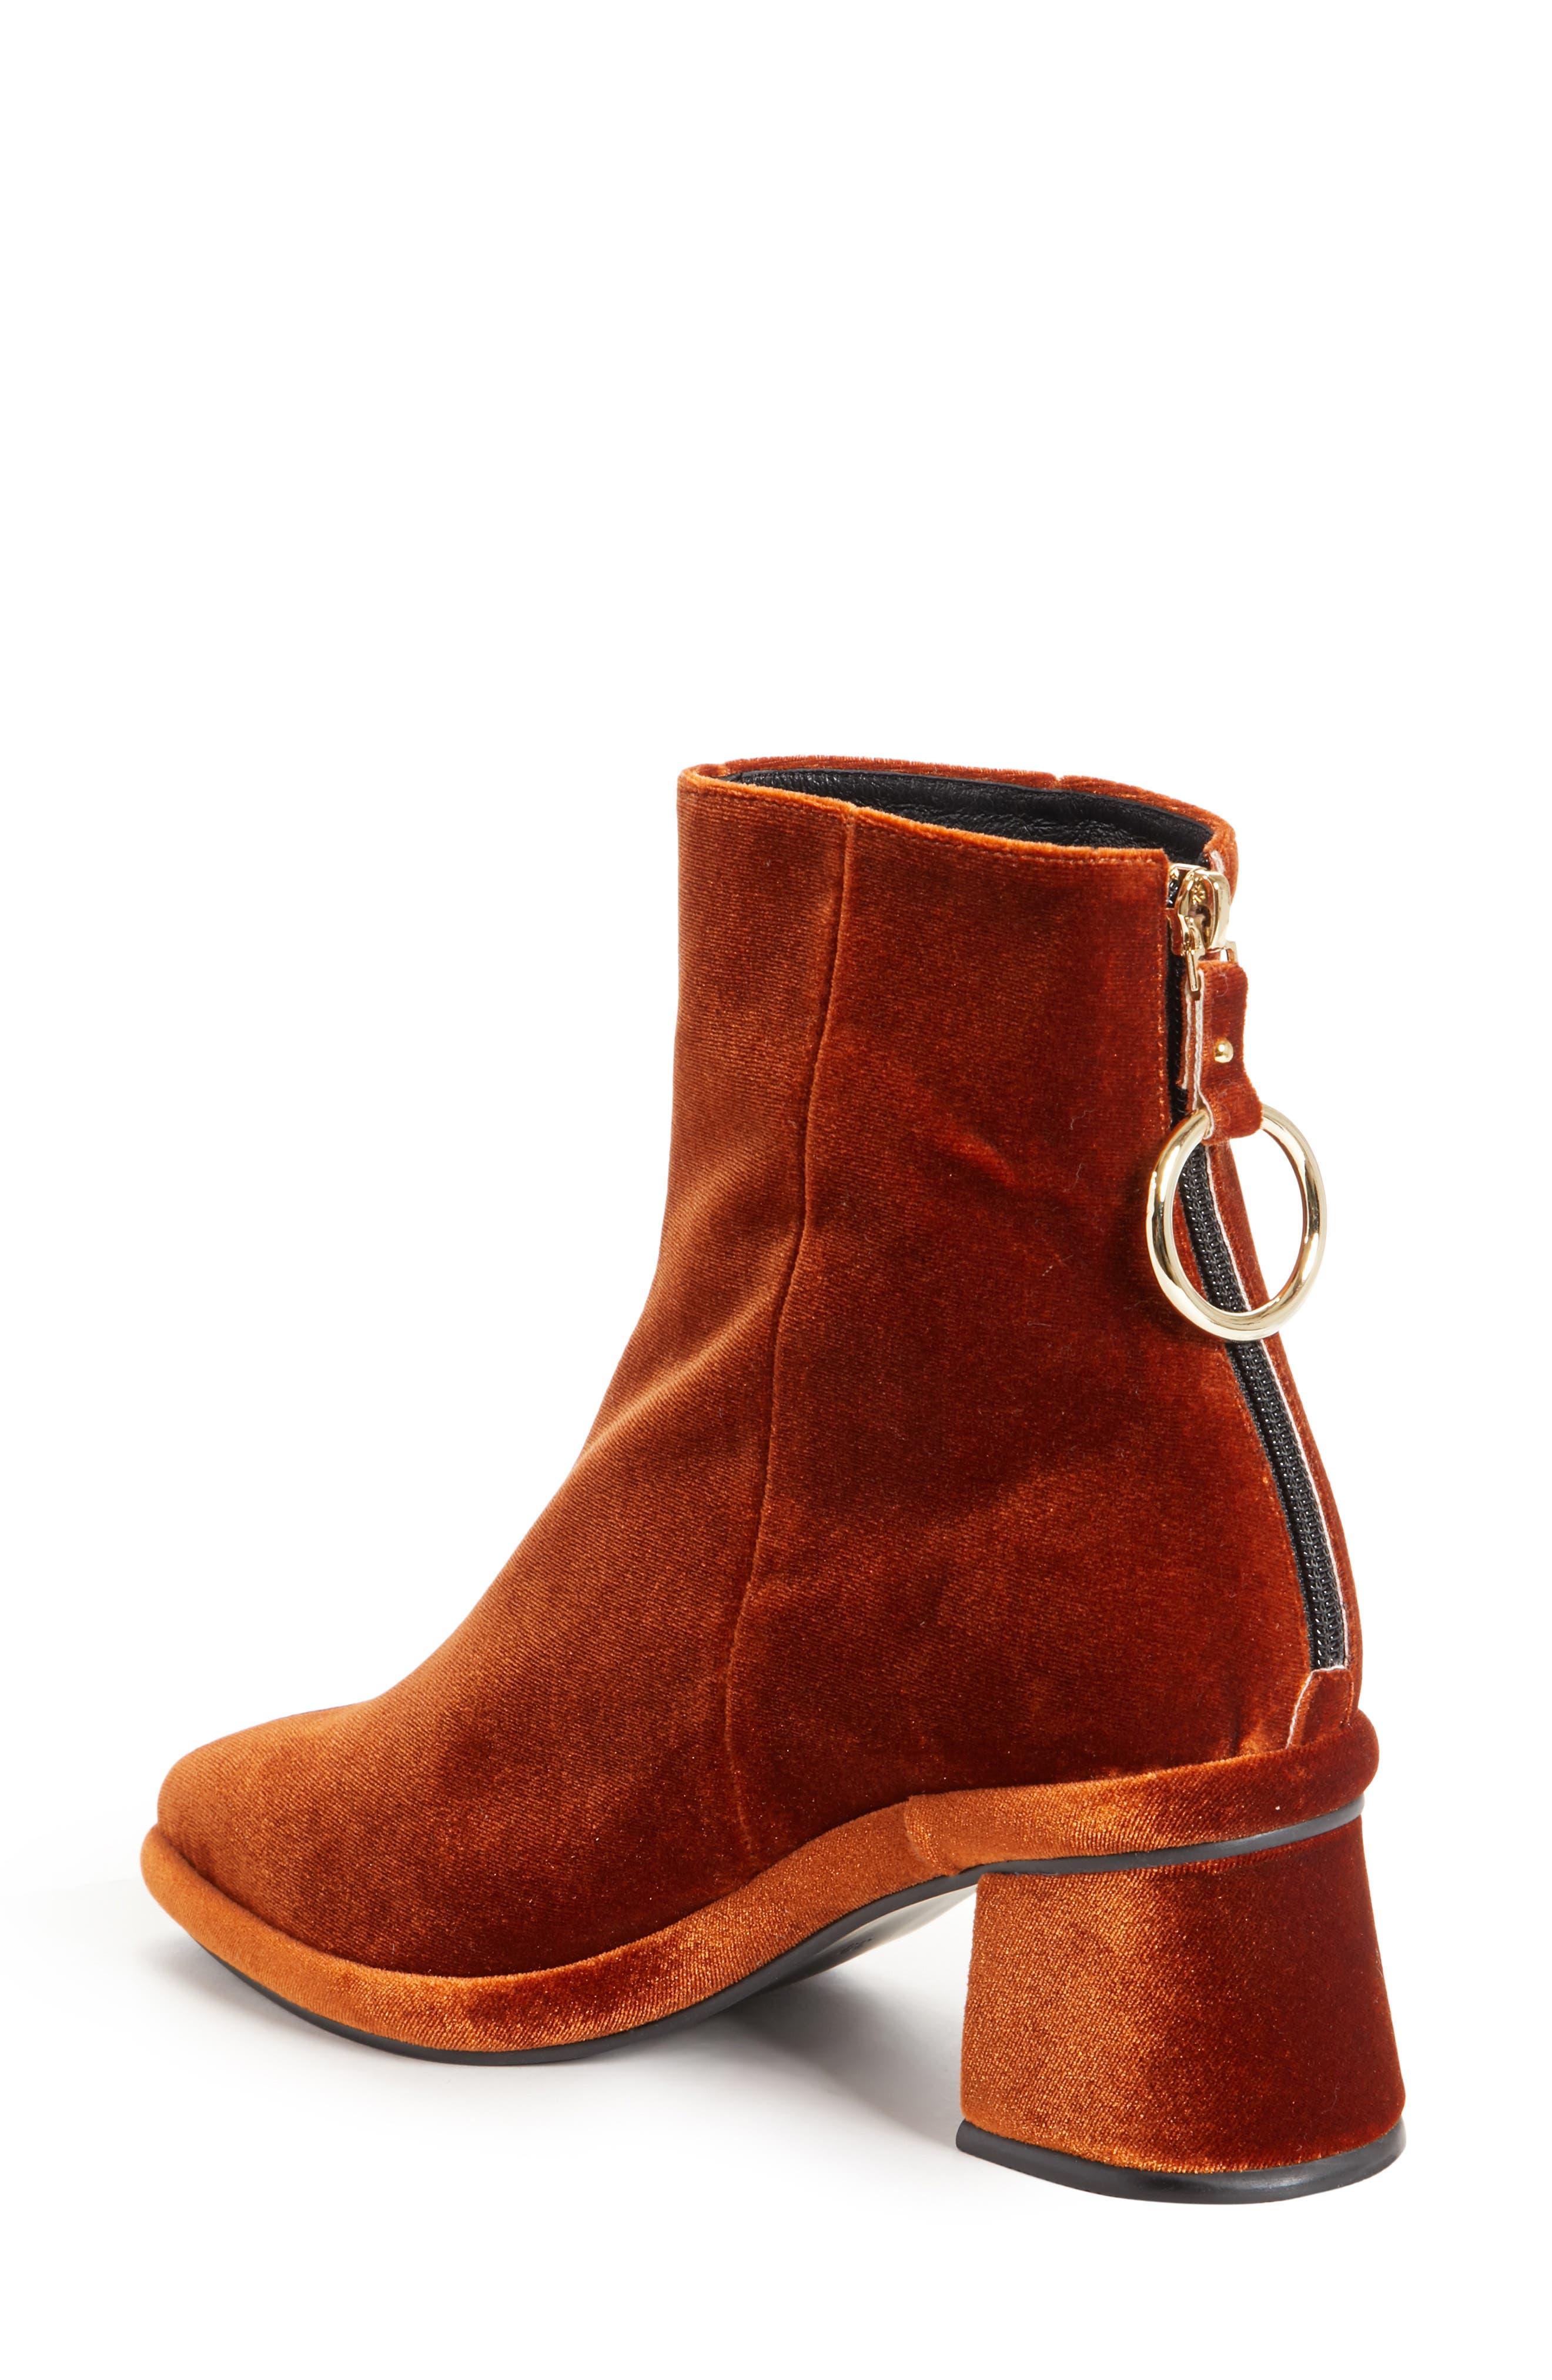 Ring Slim Boot,                             Alternate thumbnail 2, color,                             220